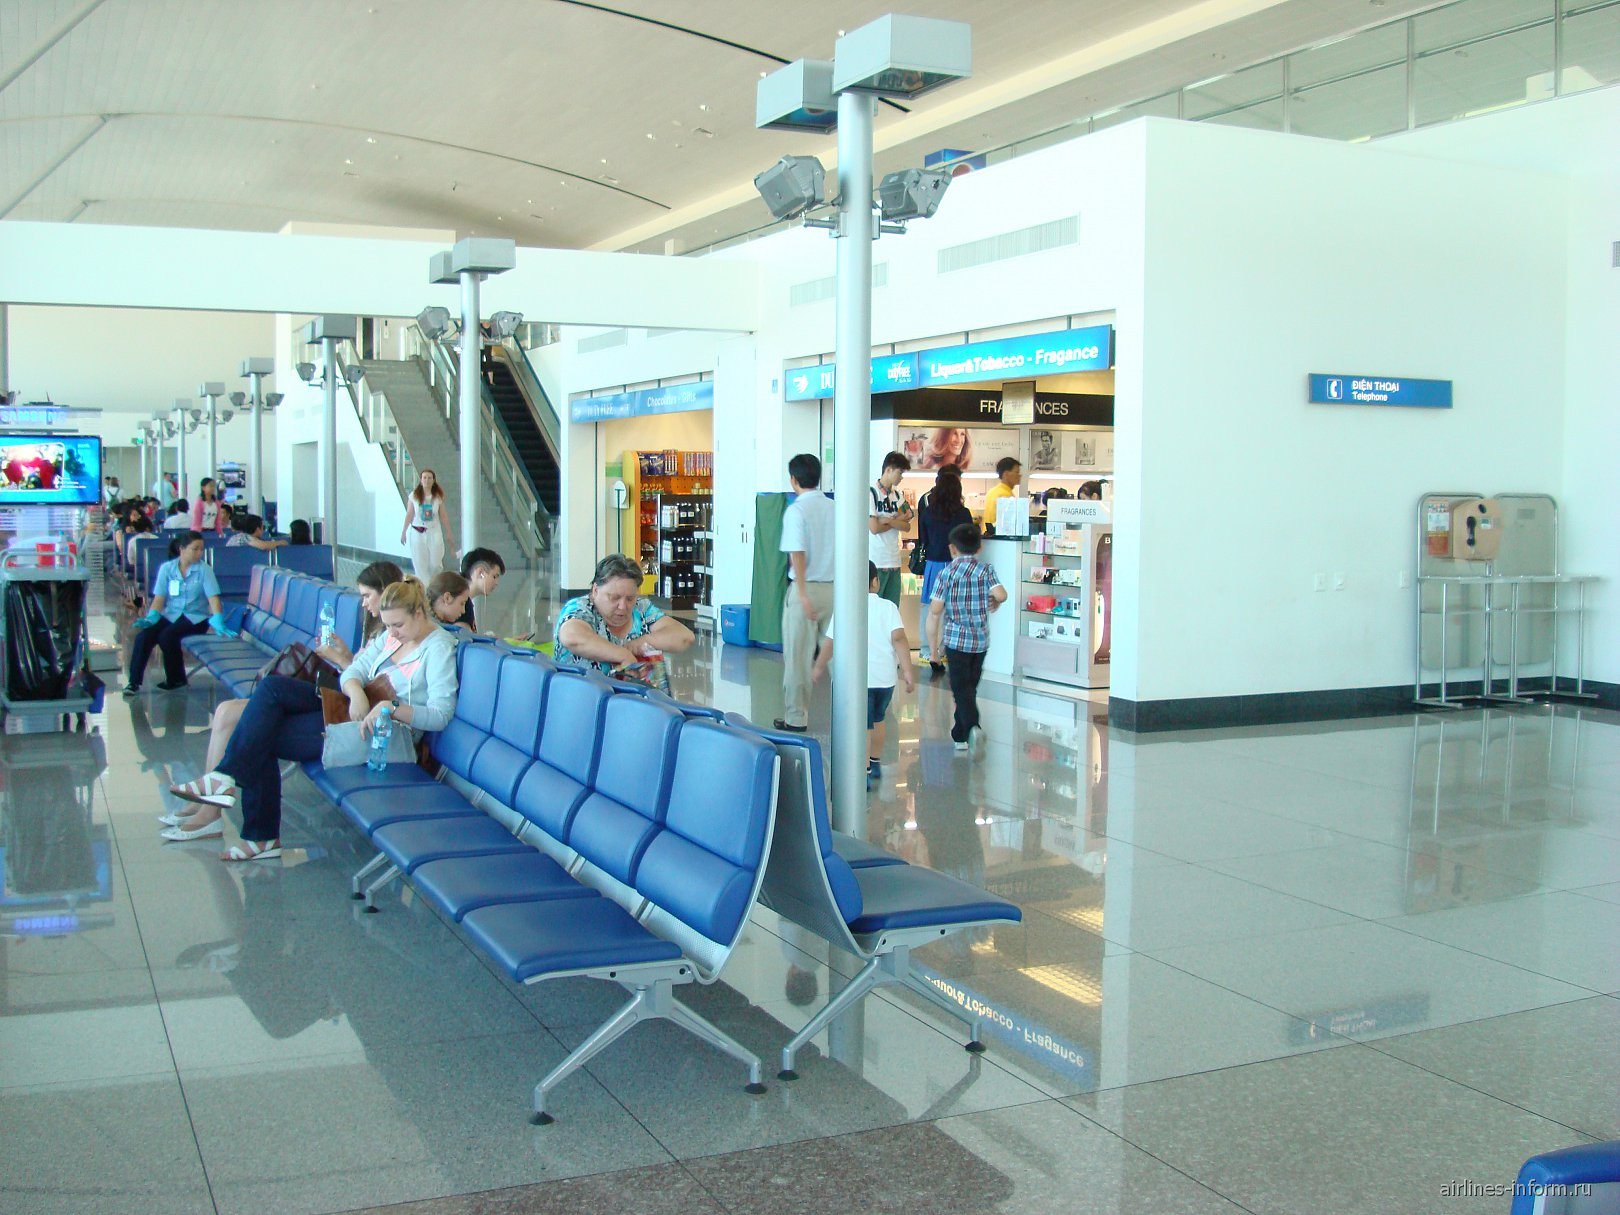 Зал ожидания в аэропорту Тан Сон Нхат в Хошимине